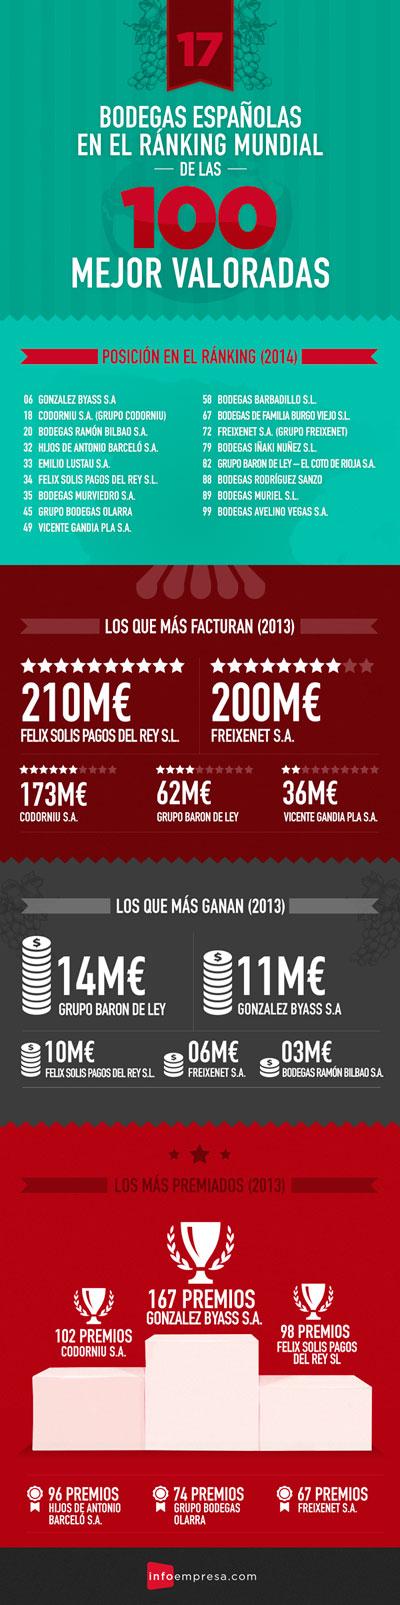 Tecnovino top 100 mundial de bodegas Espana infografia